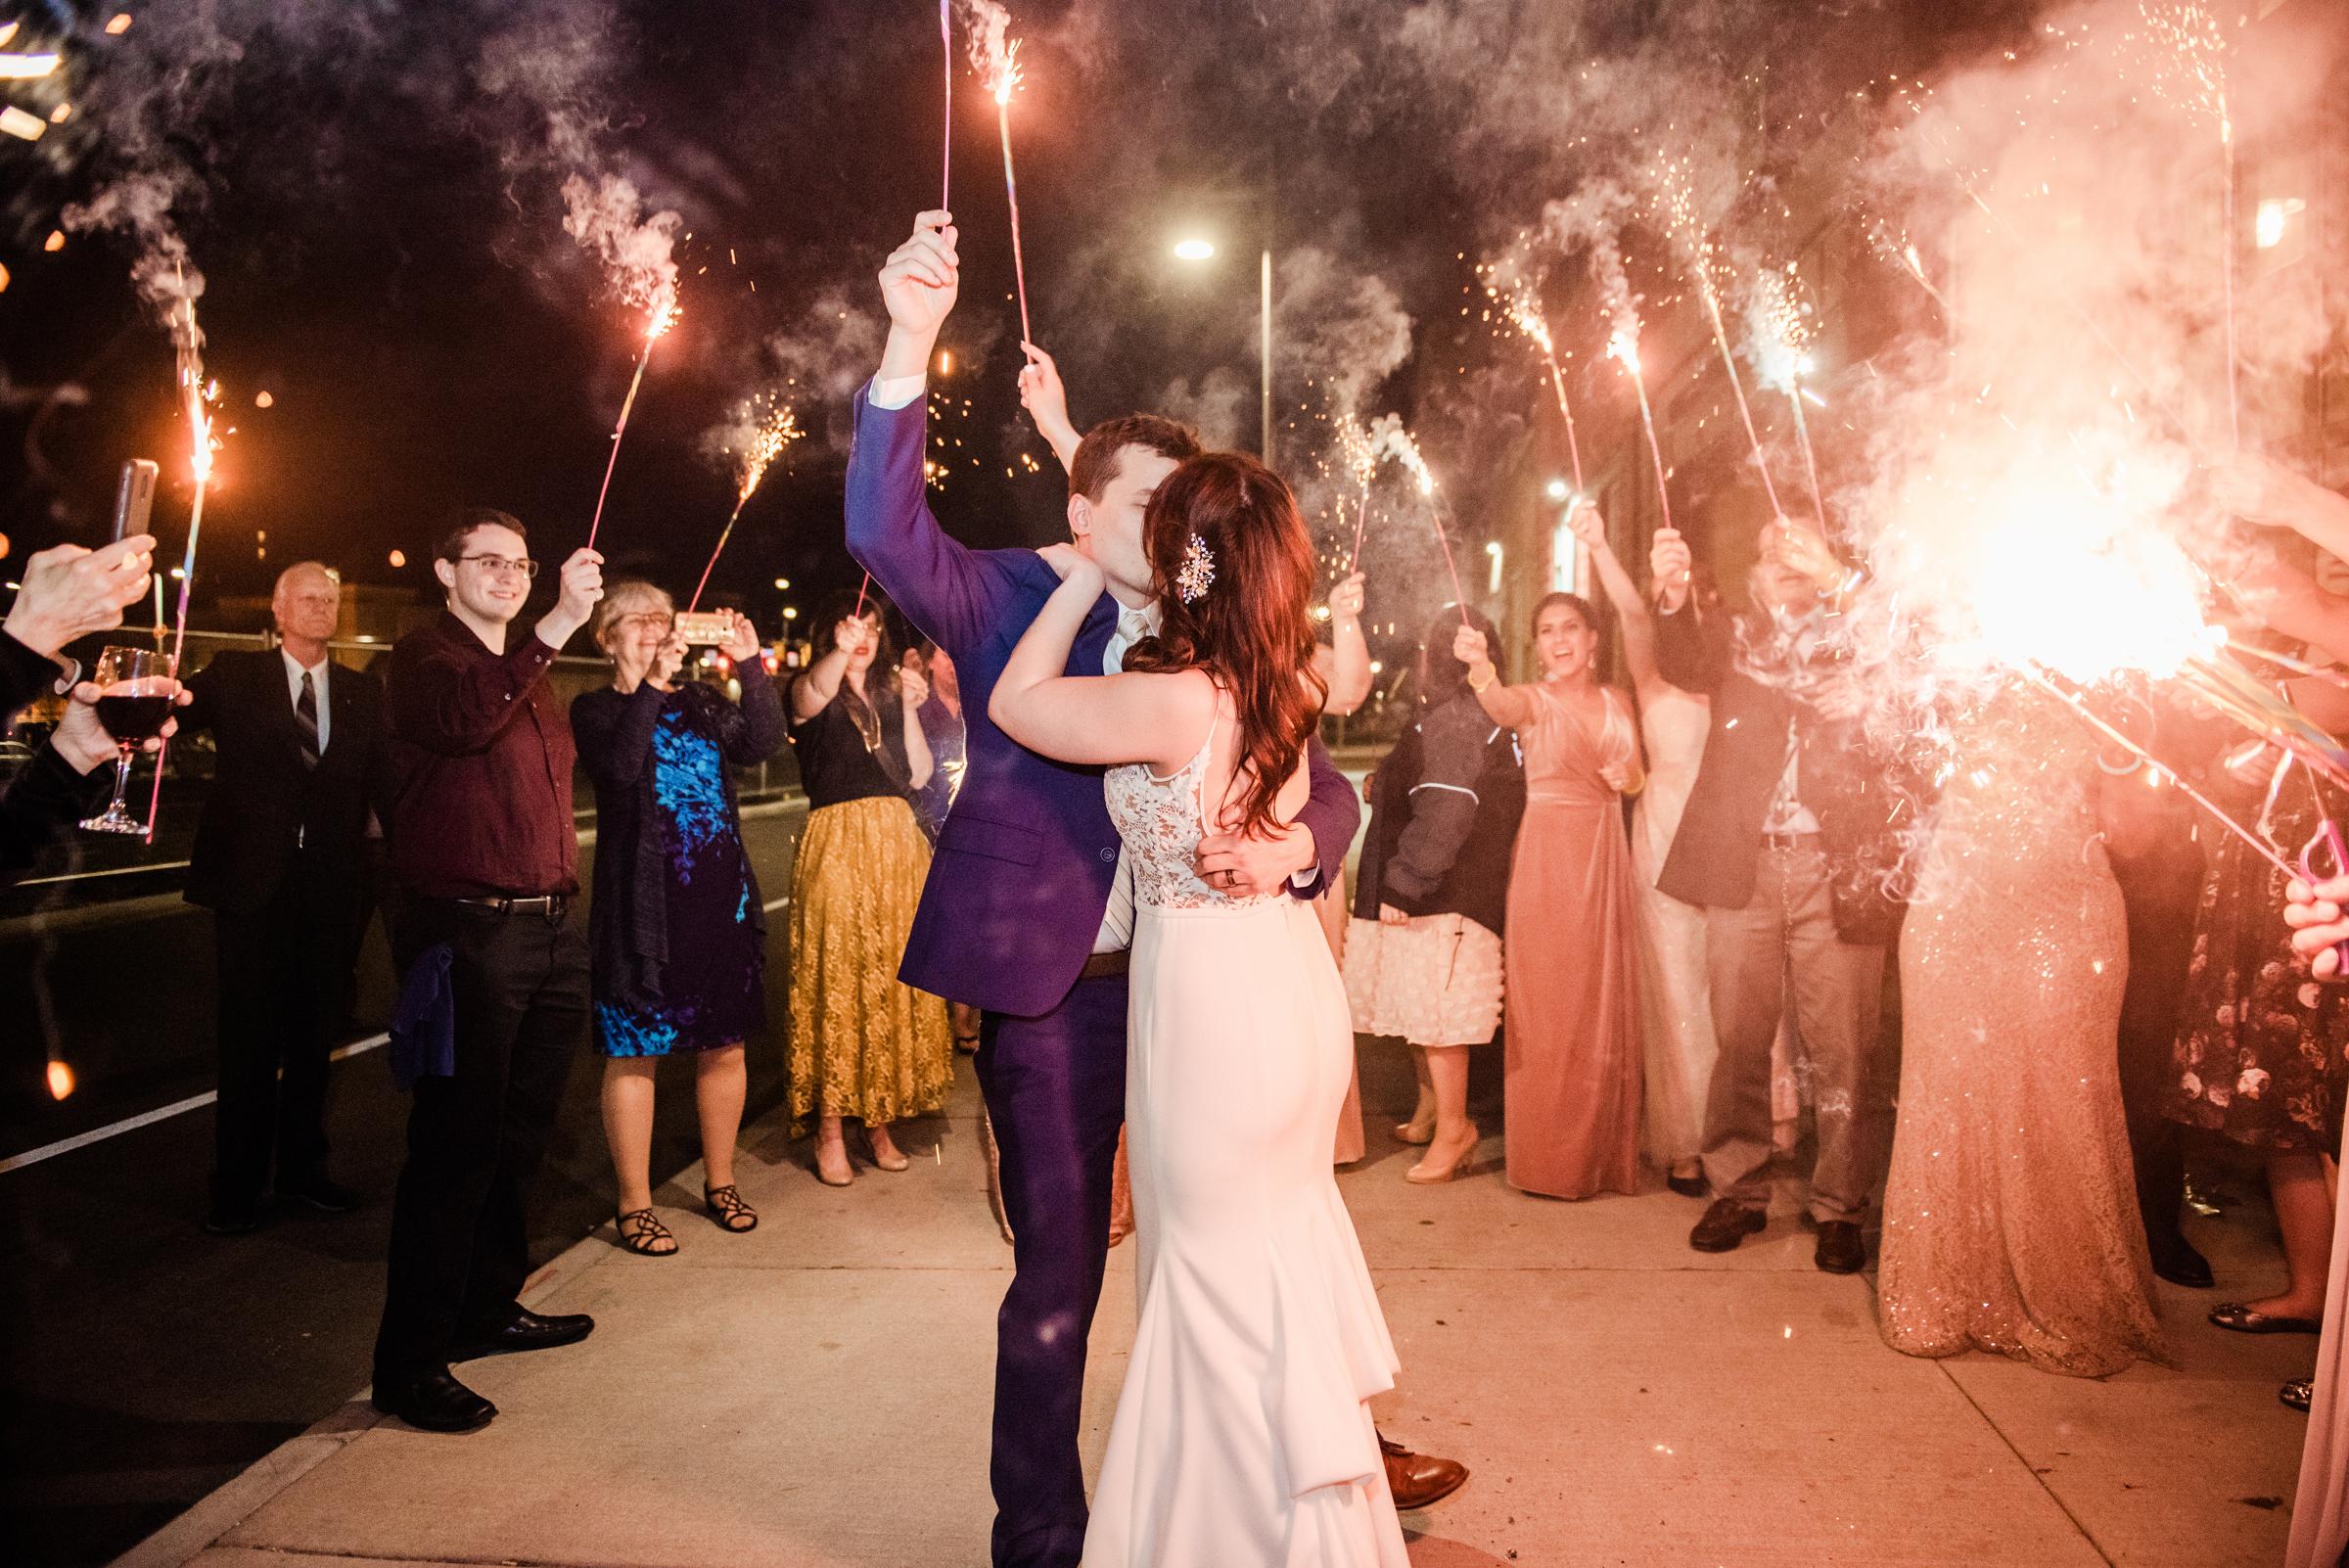 The_Arbor_LoftRochester_Wedding_JILL_STUDIO_Rochester_NY_Photographer_205203.jpg